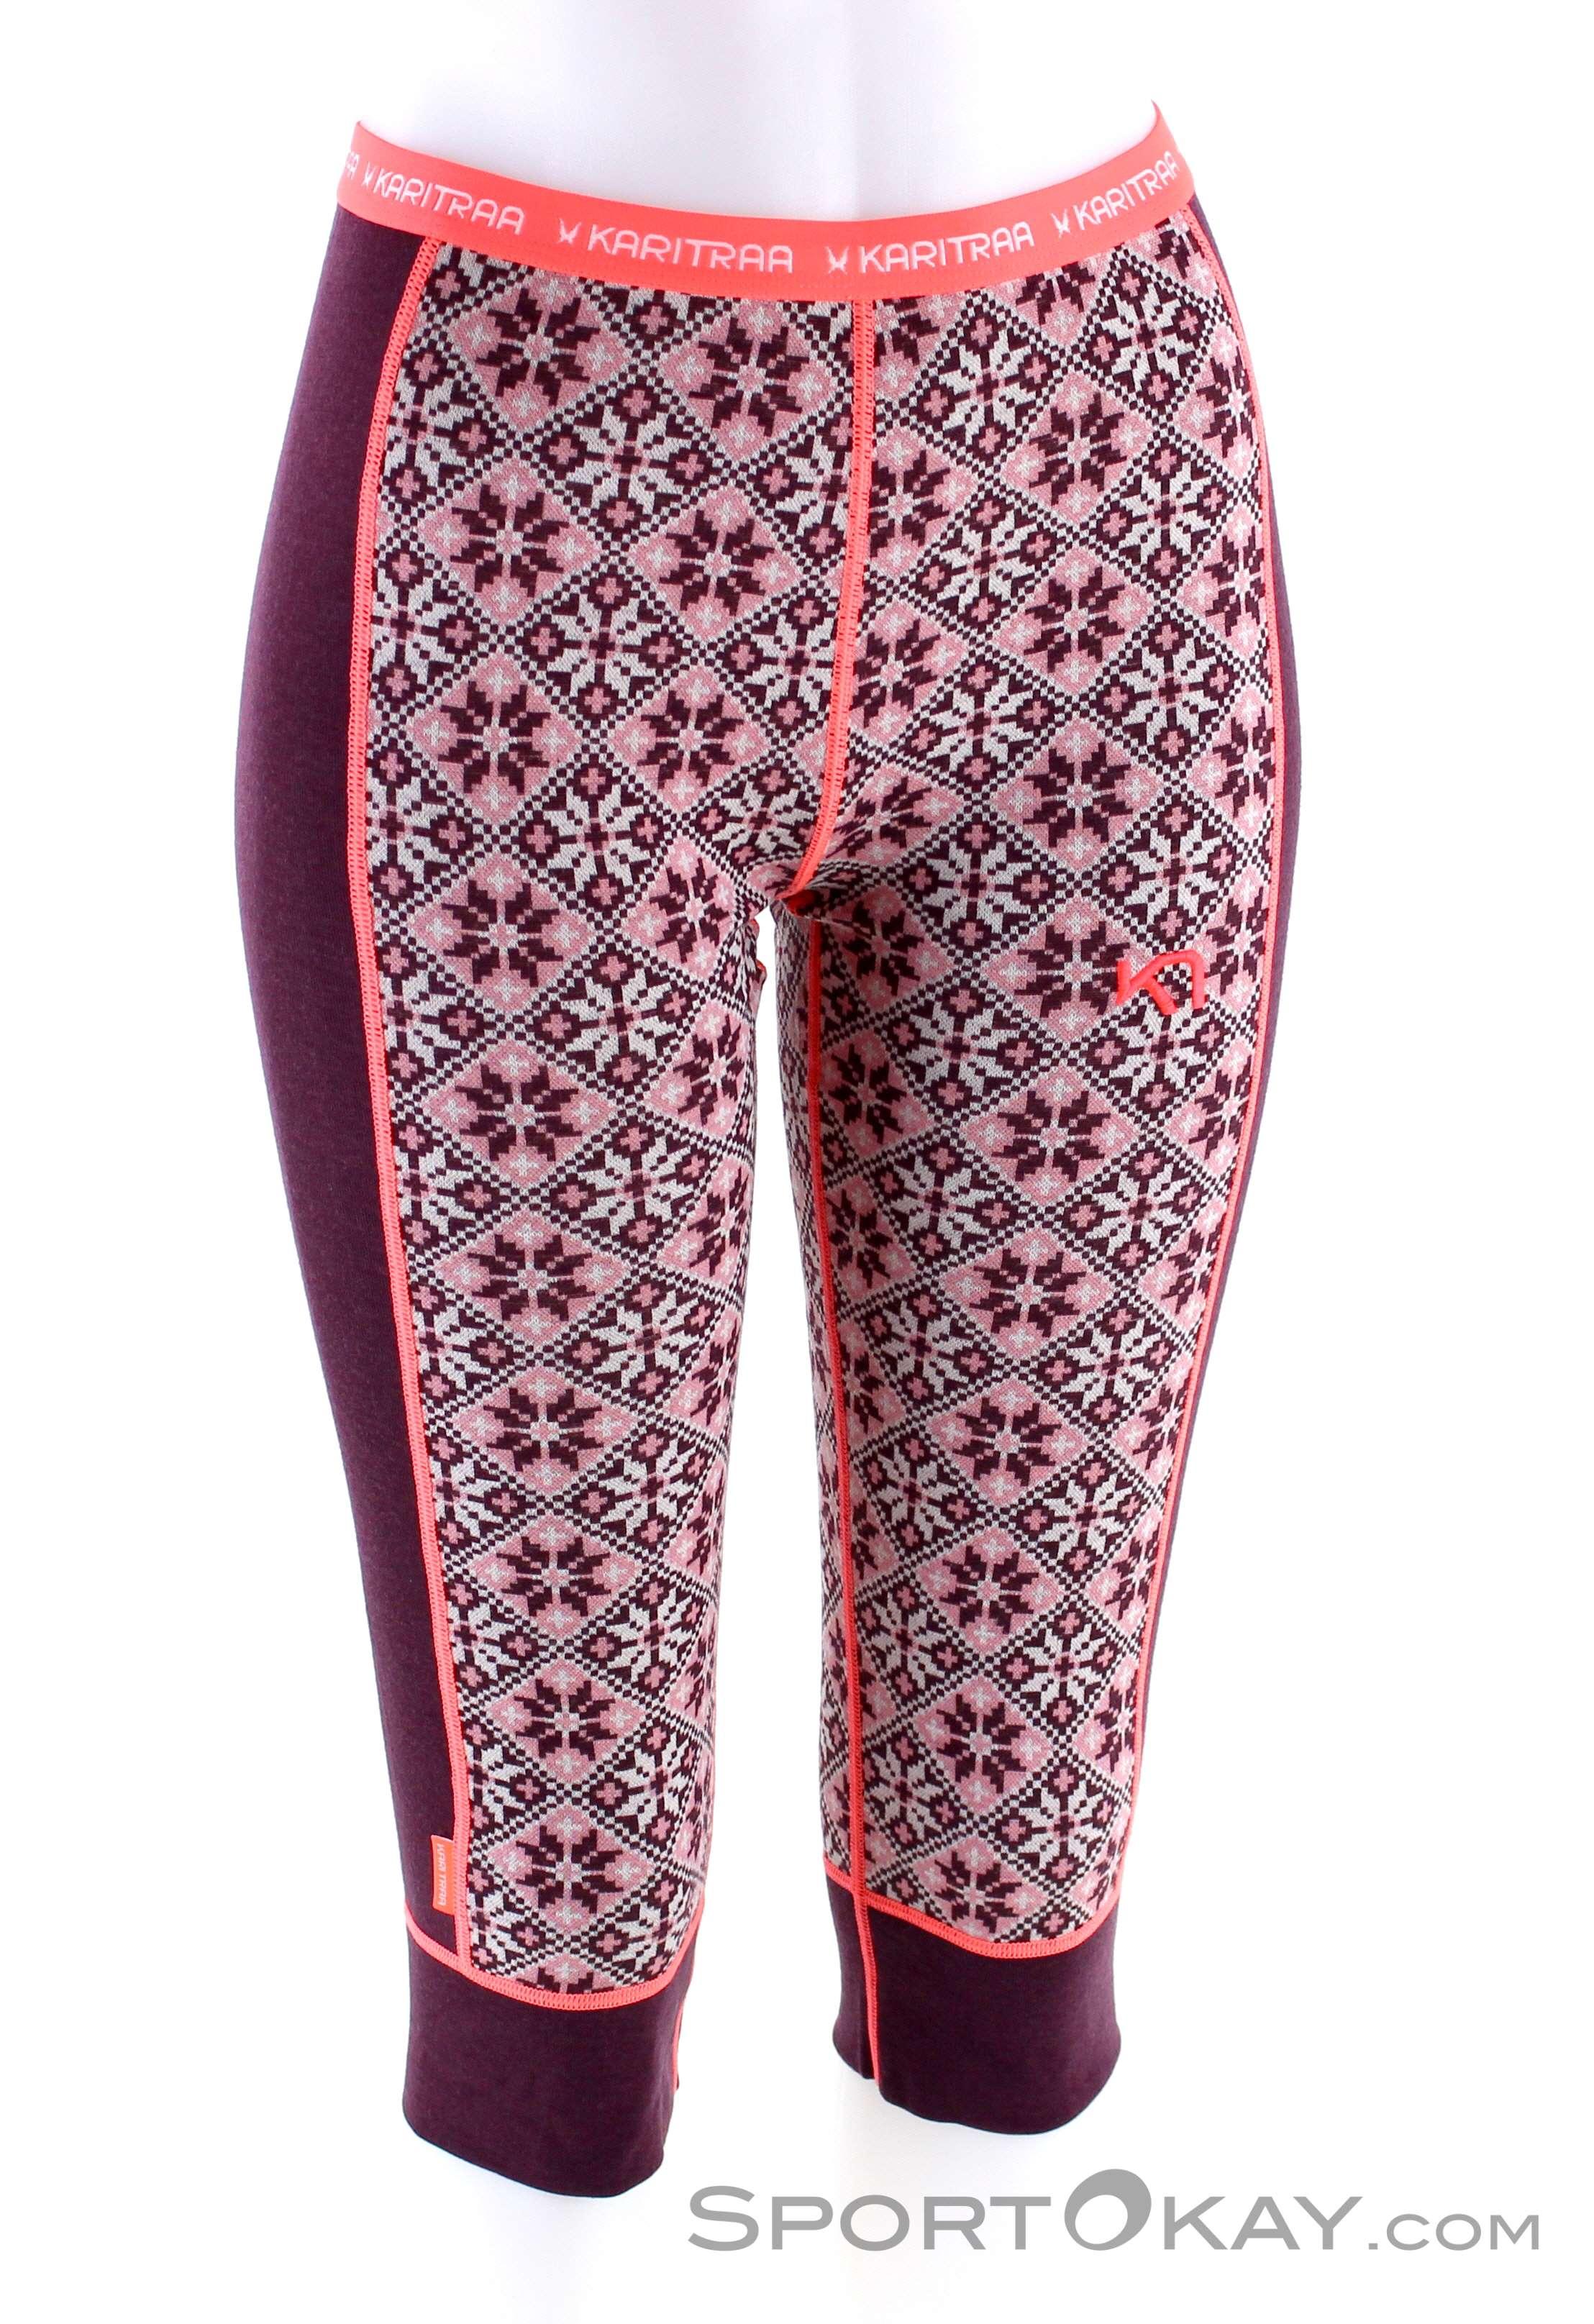 Kari Traa Damen Sjolvsagt 3//4 Hose Yoga-Hose Leggings Laufhose NEU